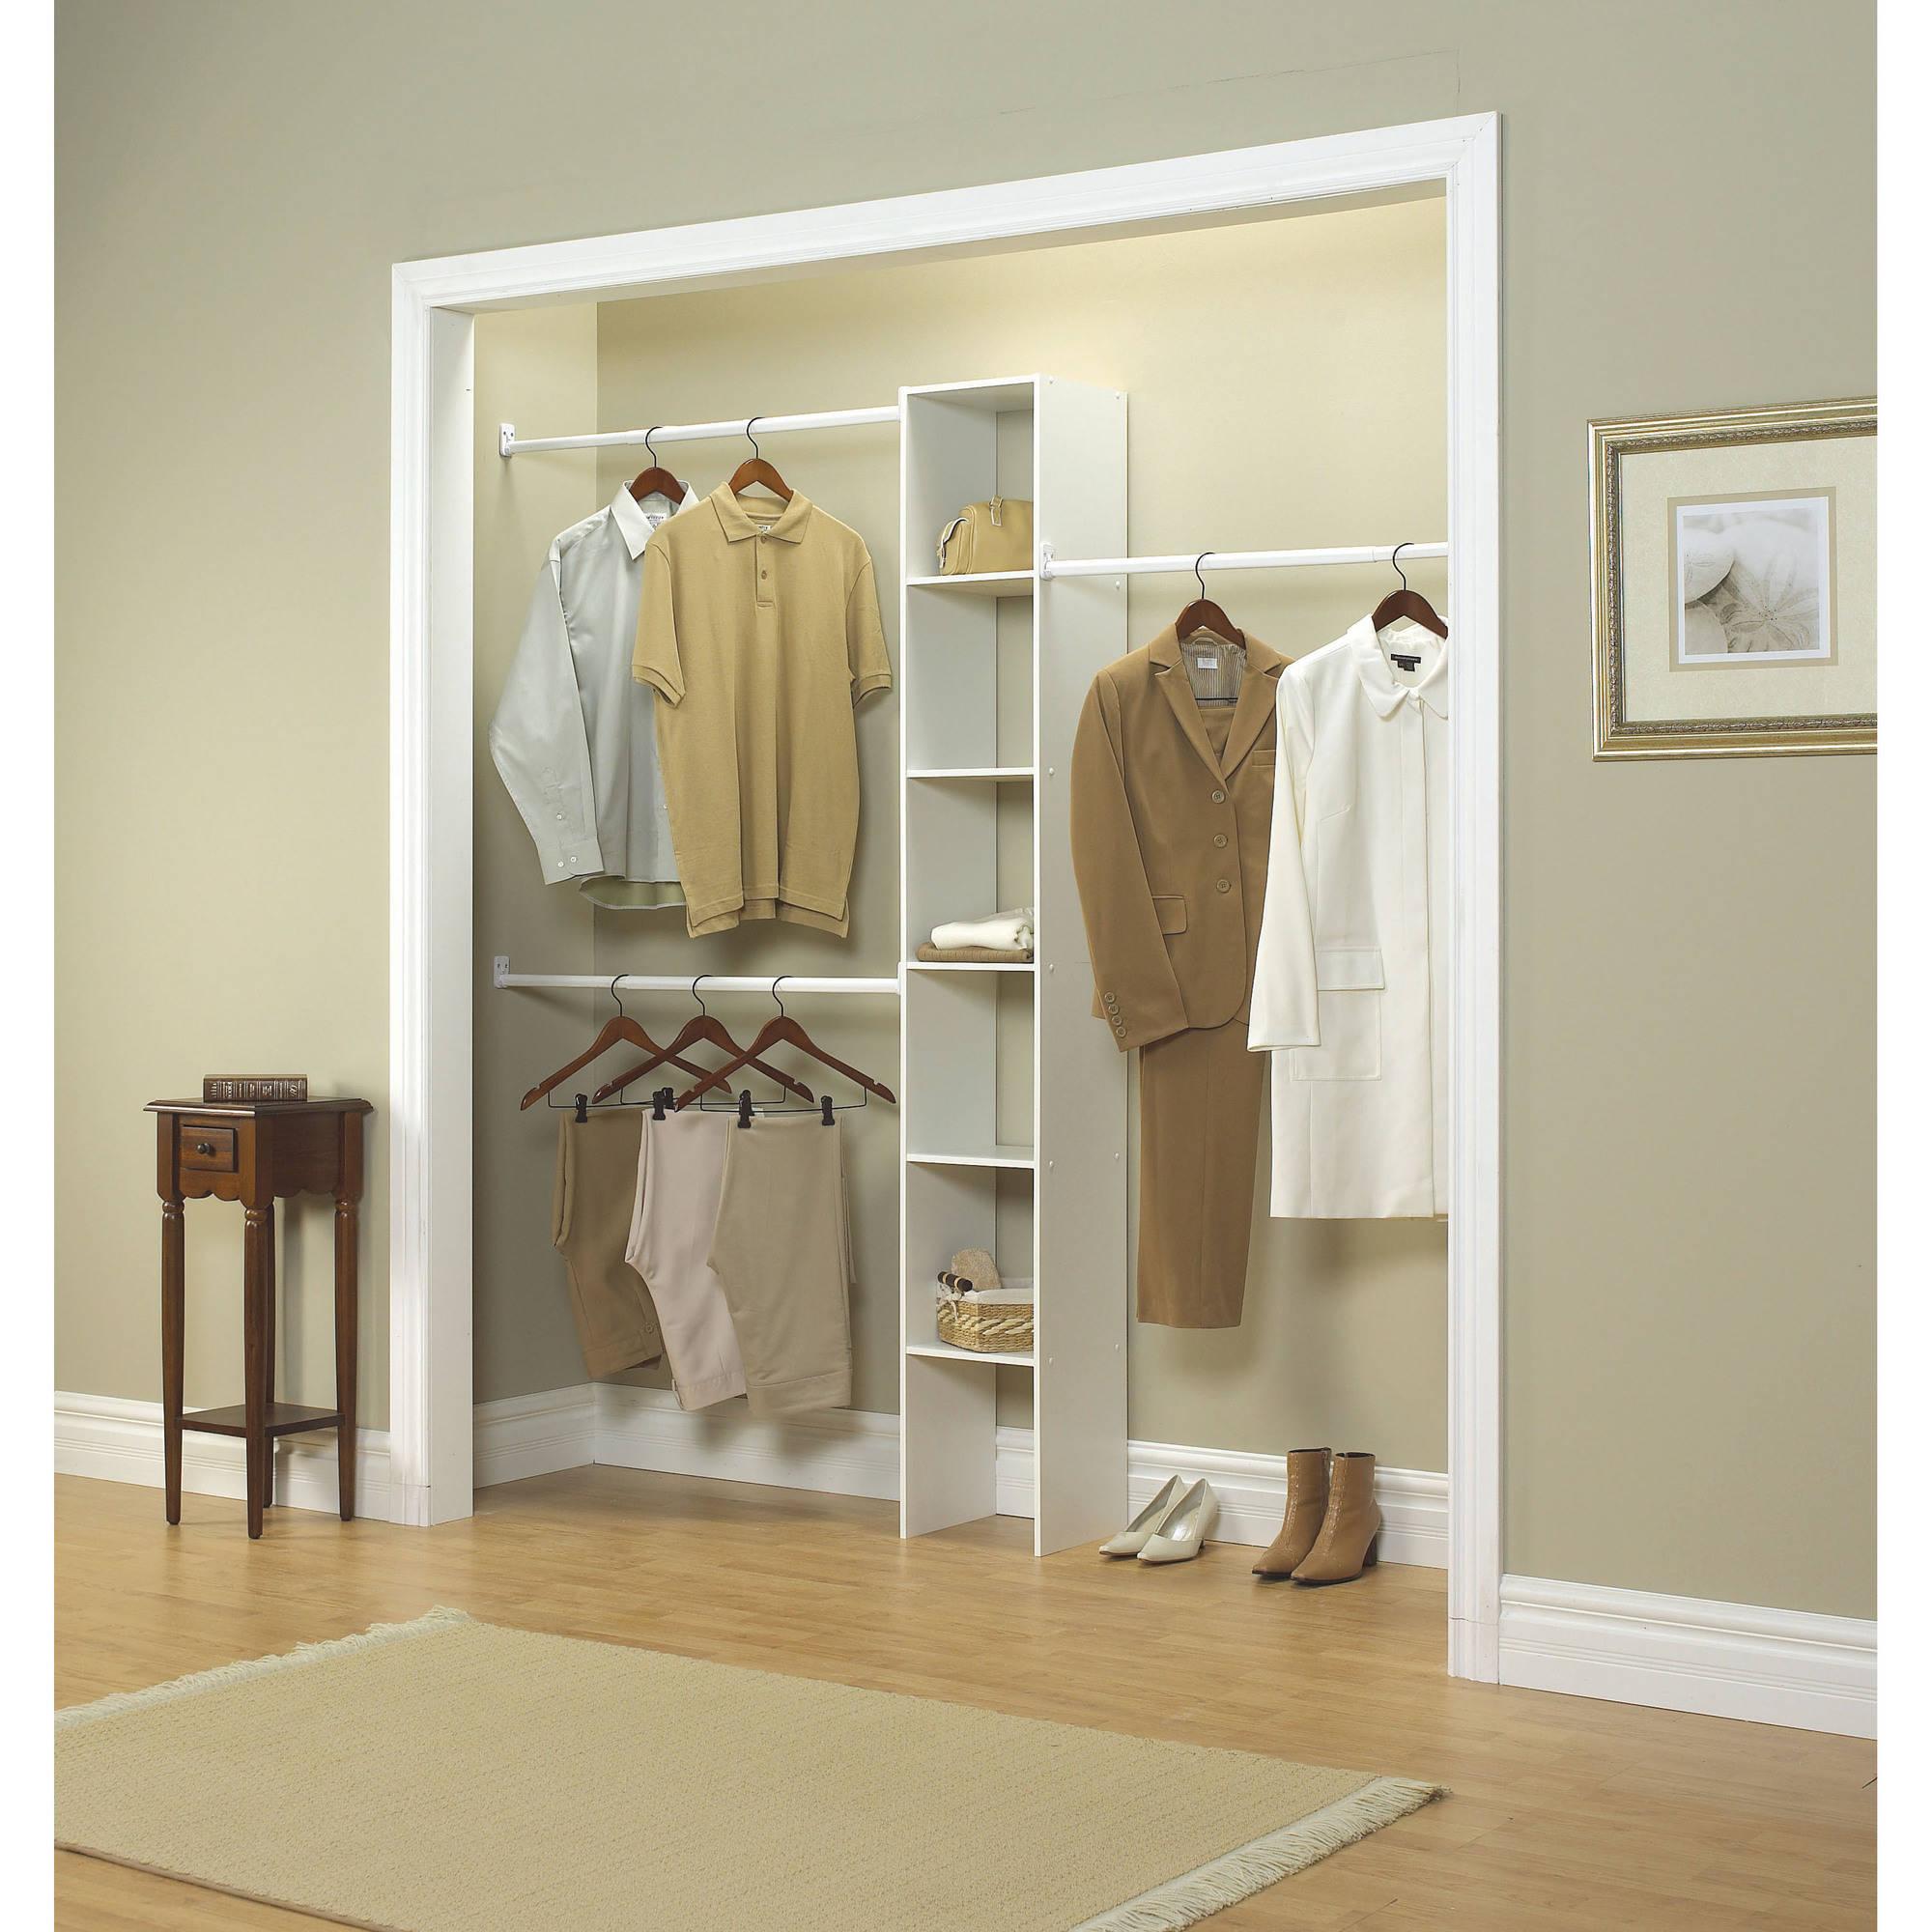 closetmaid vertical closet organizer, 12 WCVMBWI